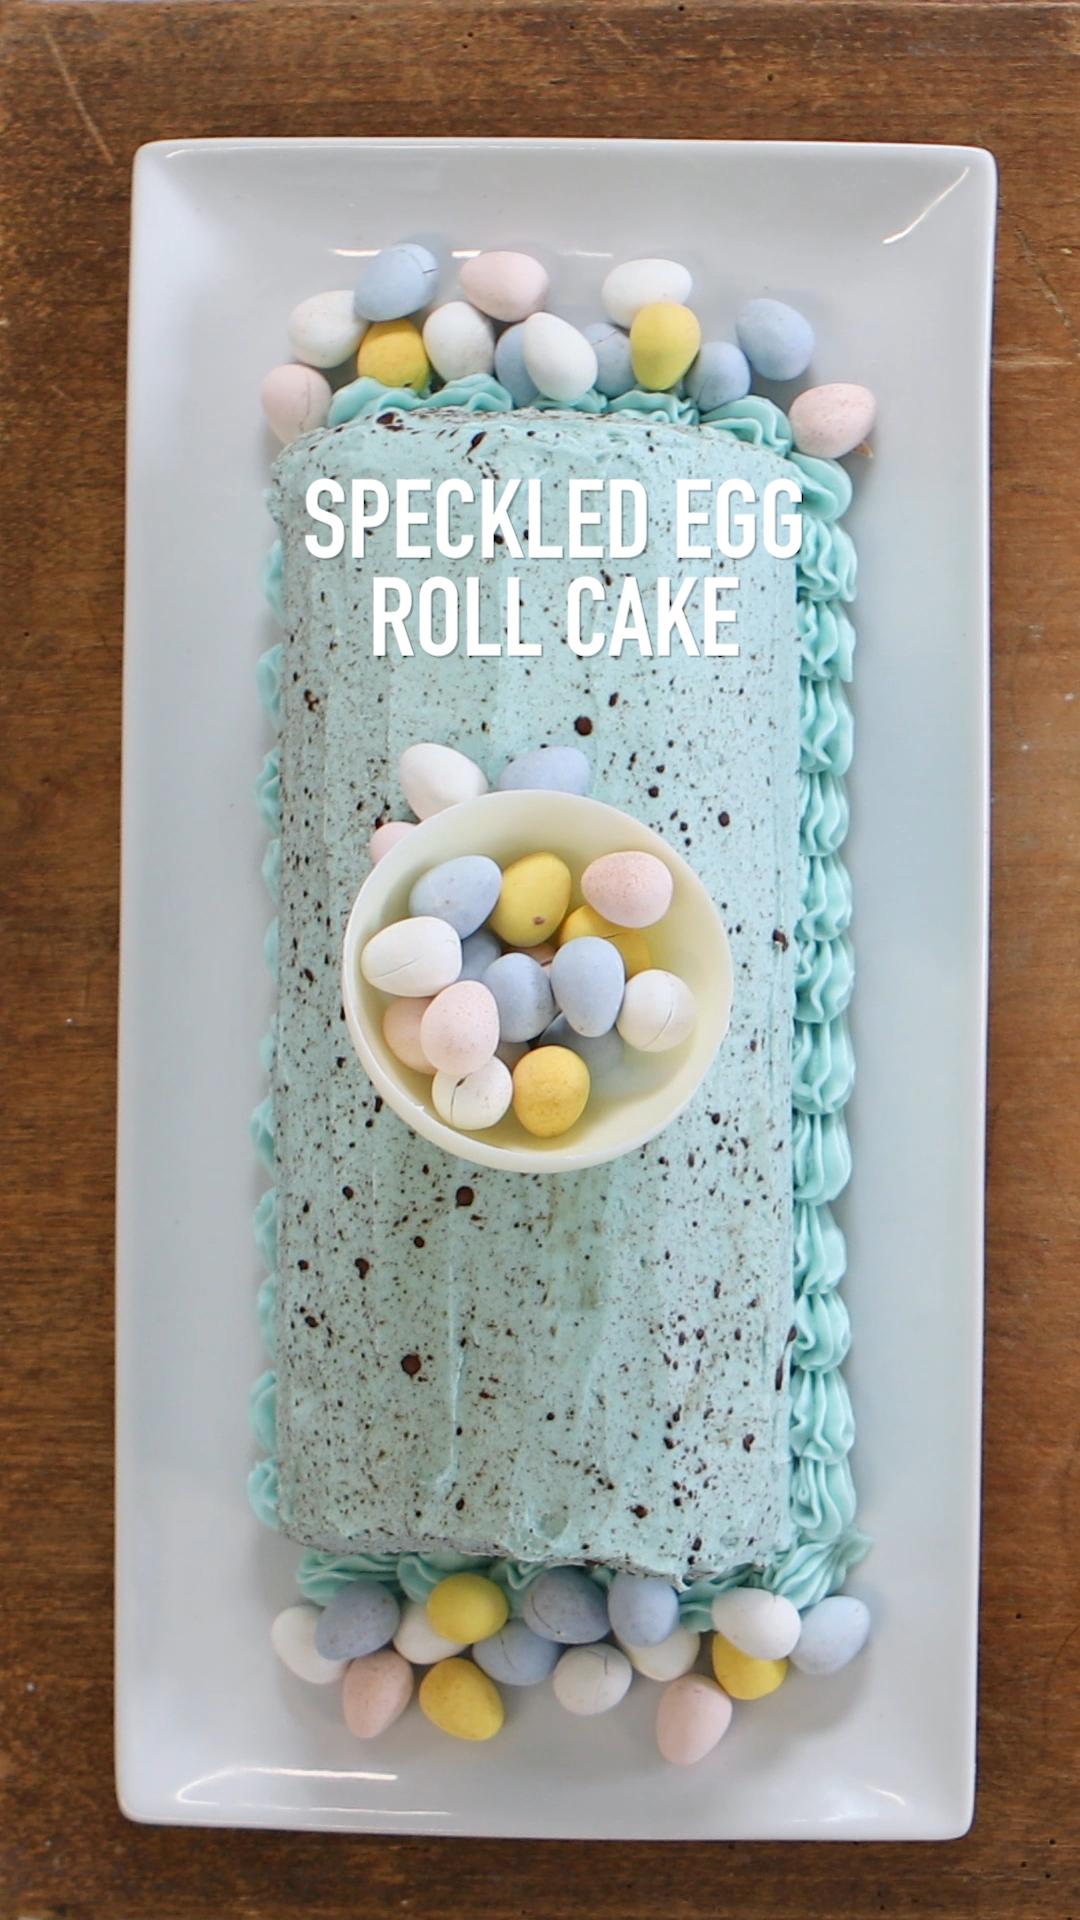 Speckled Egg Roll Cake